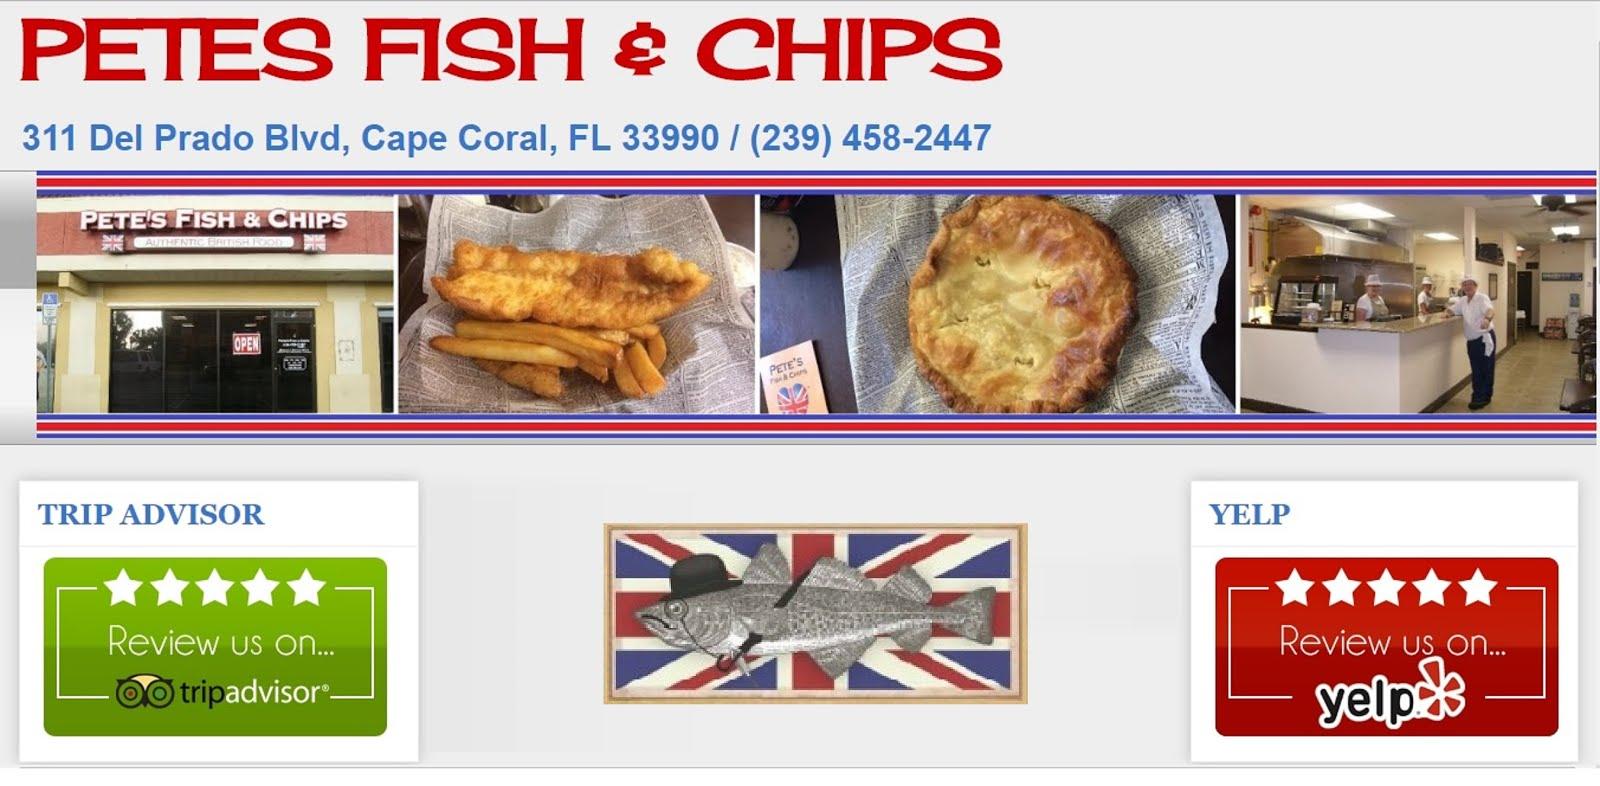 PETES FISH & CHIPS